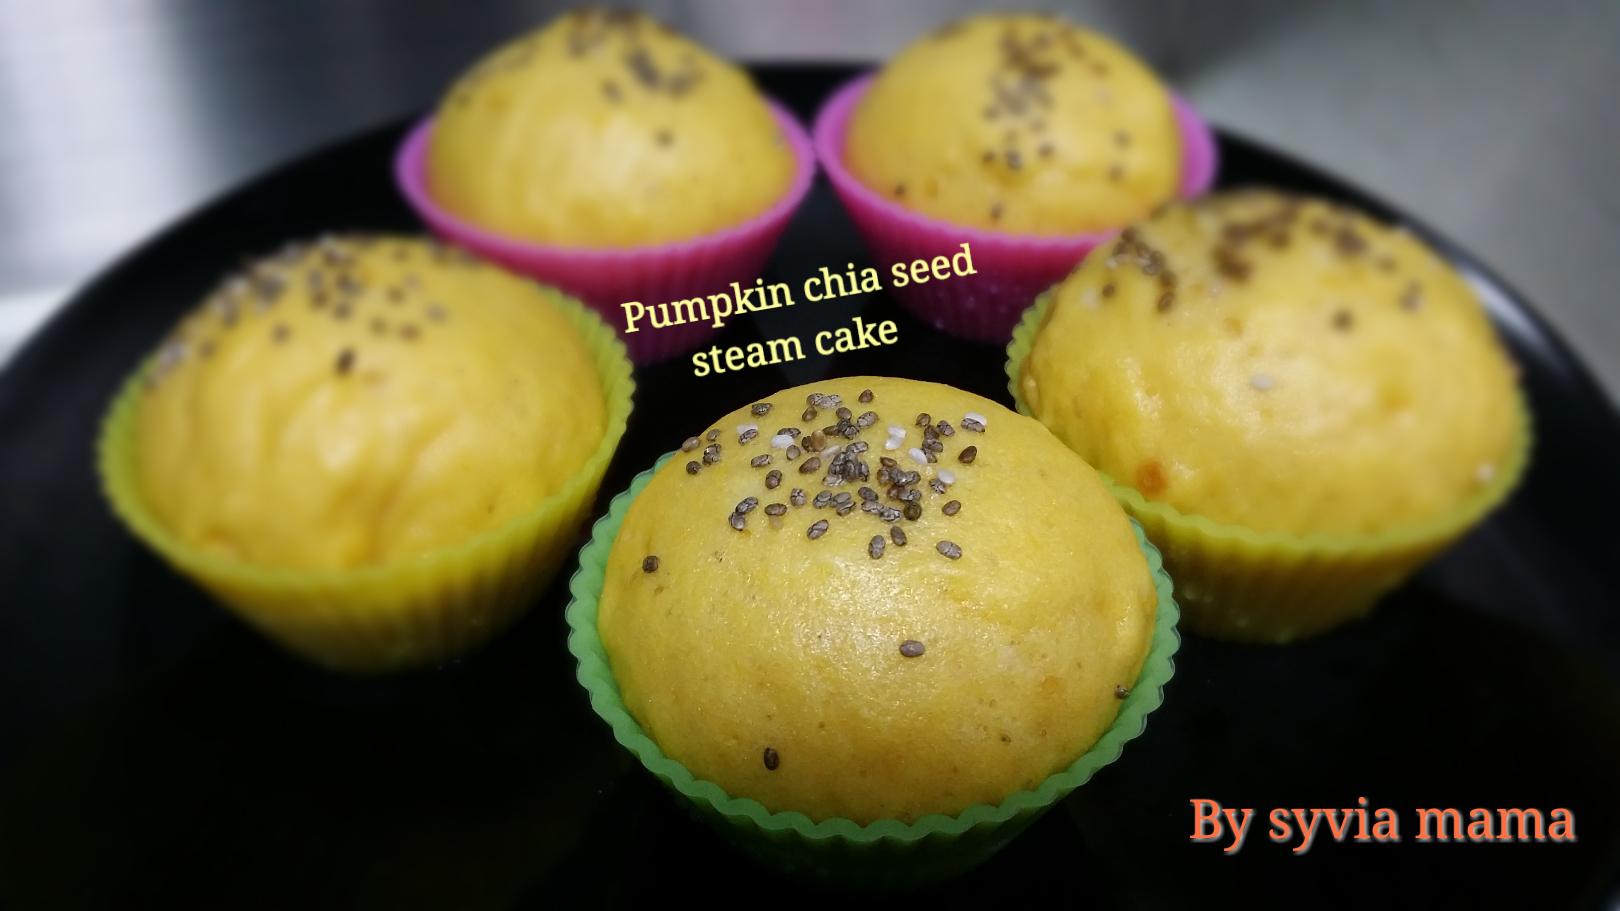 Pumpkin Chia Seeds Steam Cake My Baby Recipe